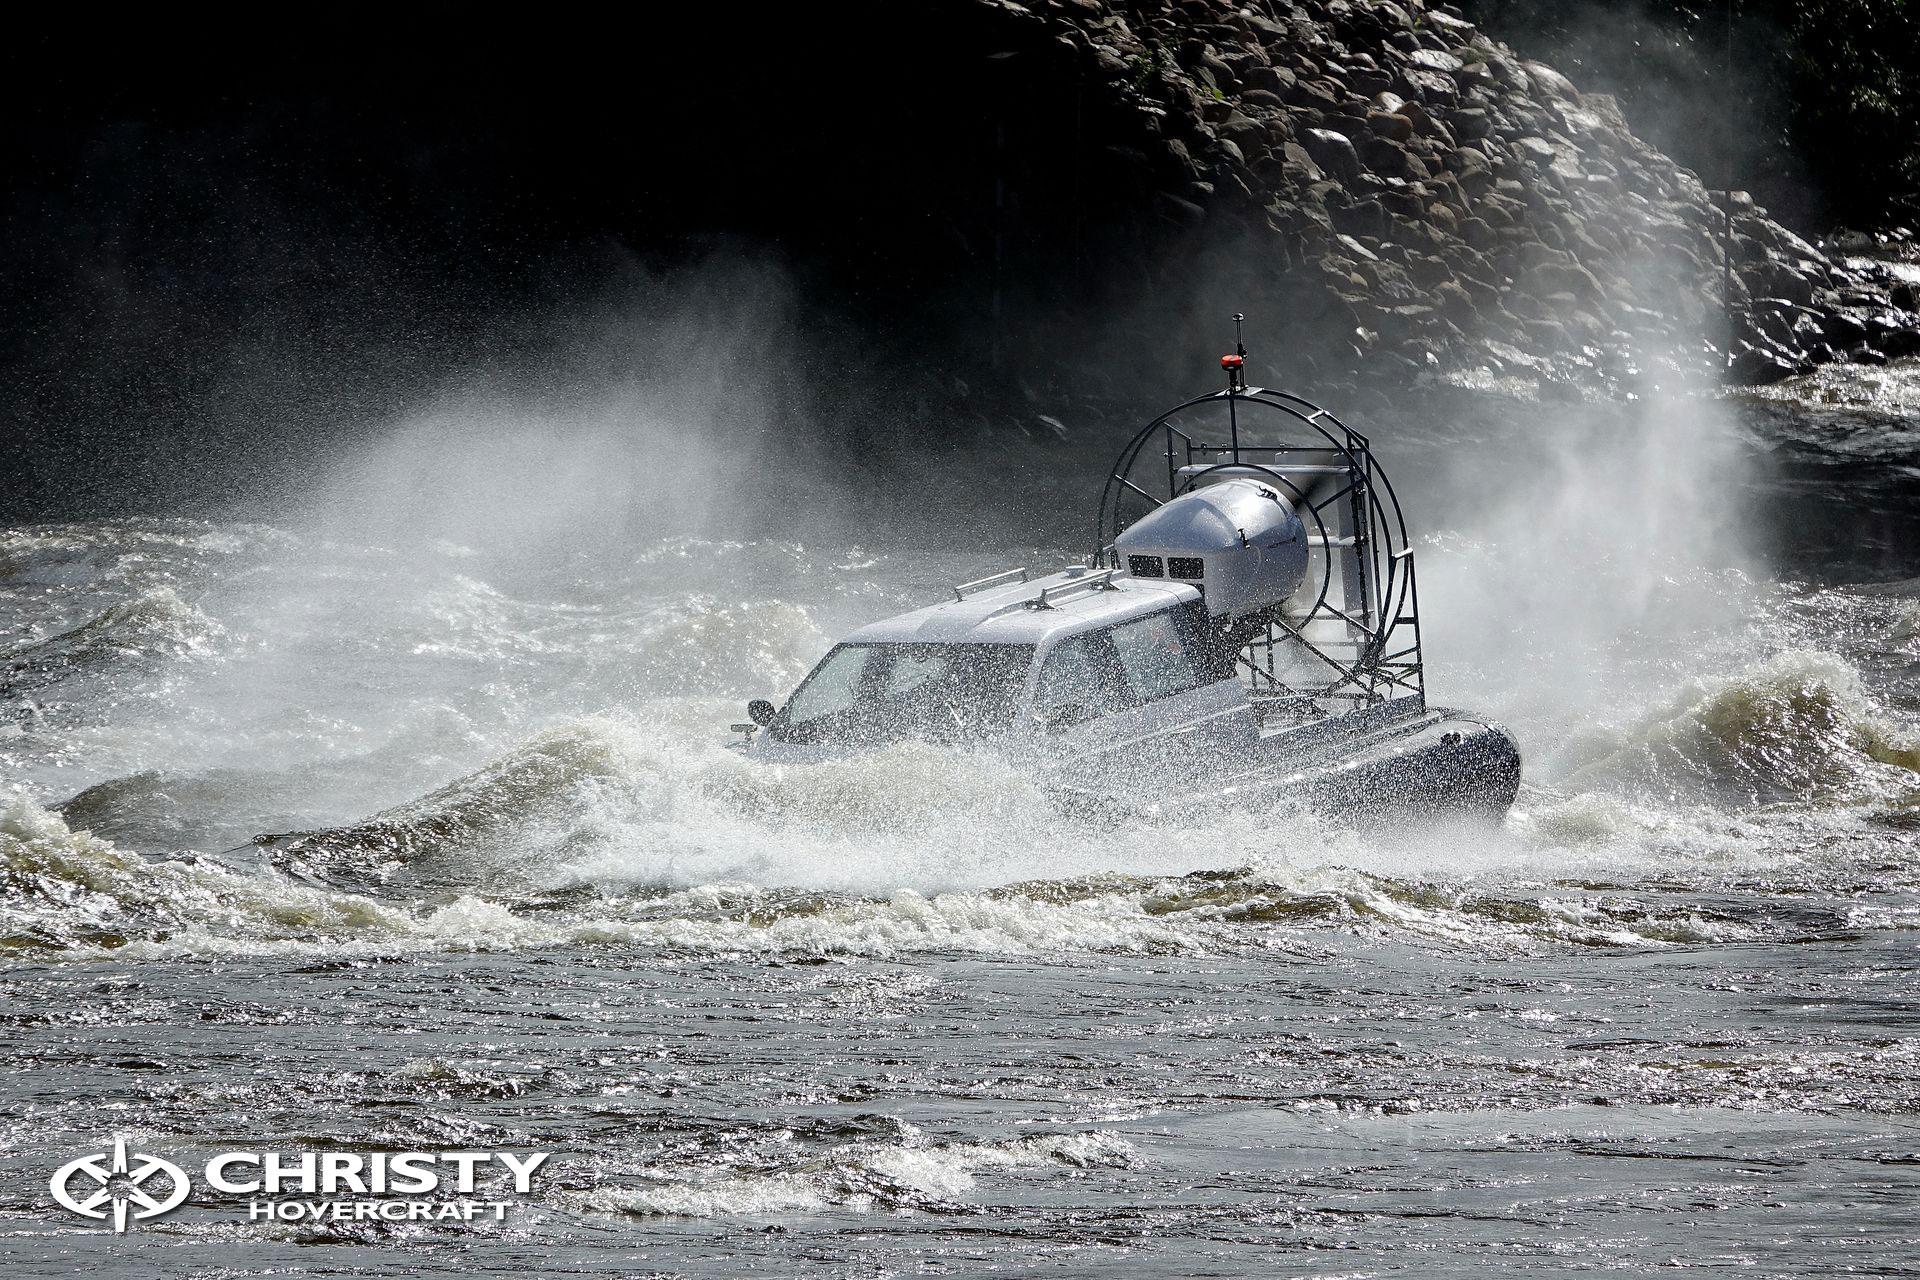 Hovercraft-Christy-5146-FC-02.jpg | фото №4